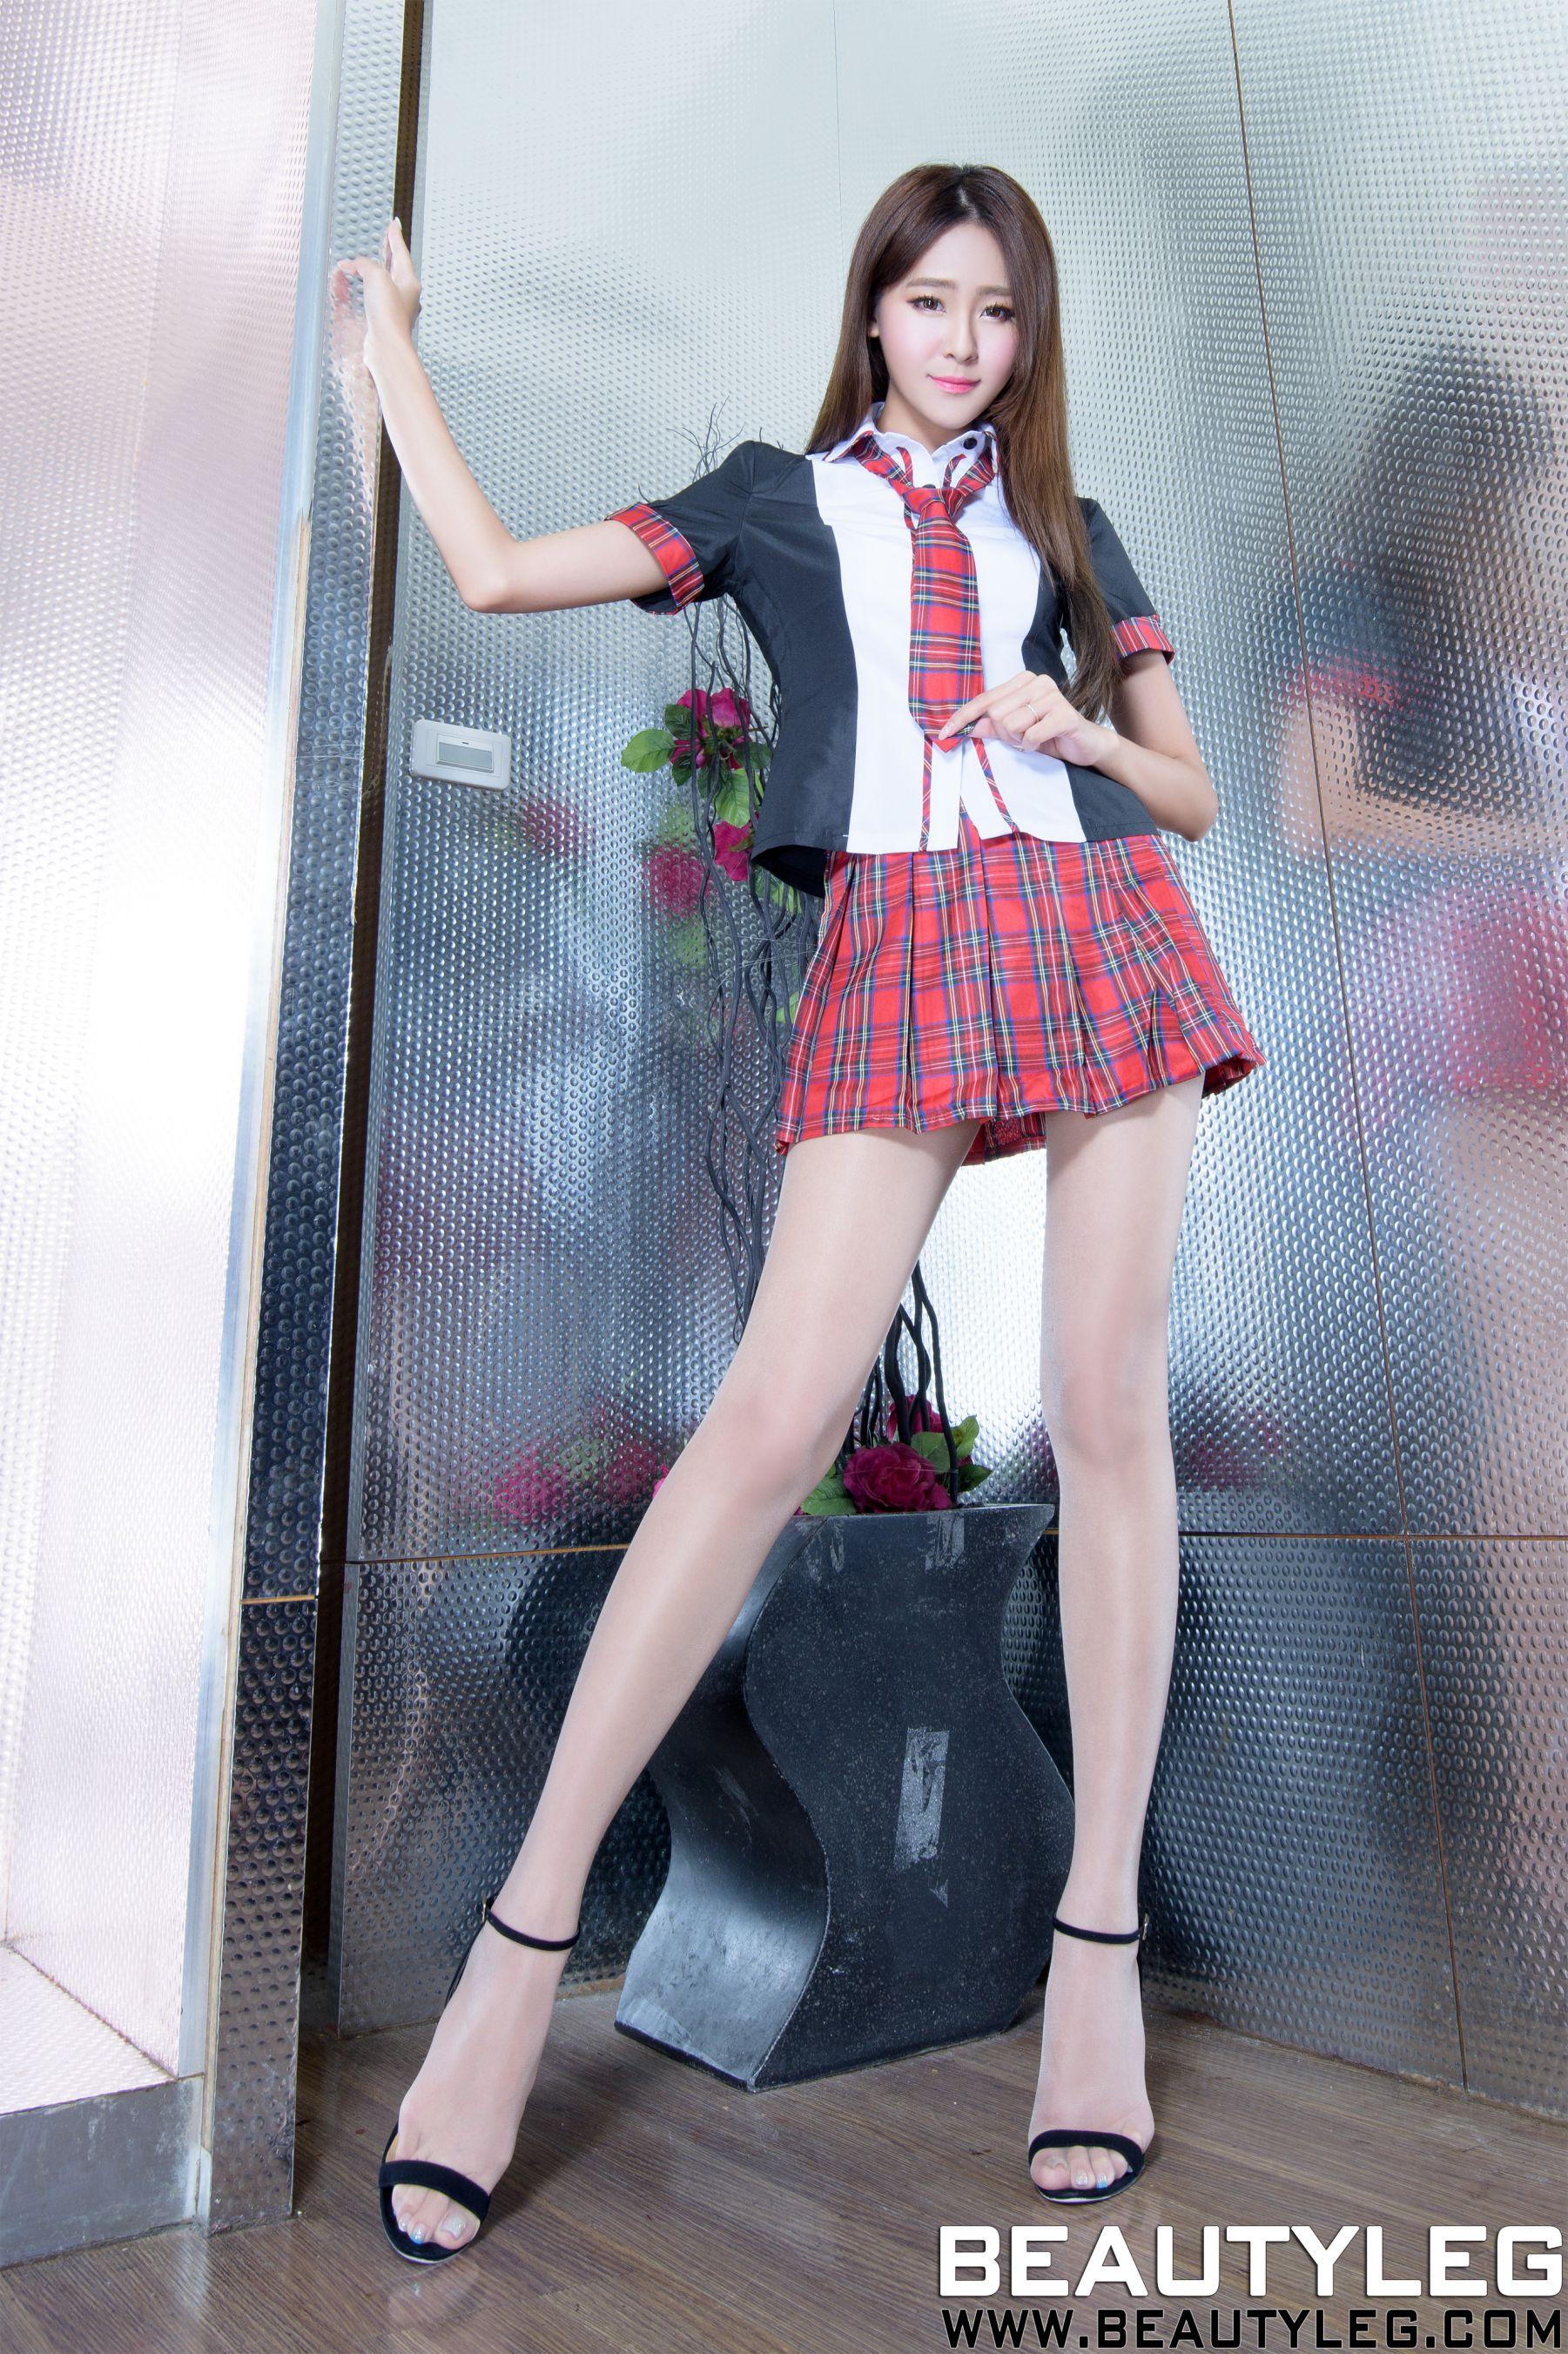 VOL.372 [Beautyleg]美腿长腿美女:Winnie小雪(庄咏惠,庄温妮,腿模Winnie)高品质写真套图(38P)